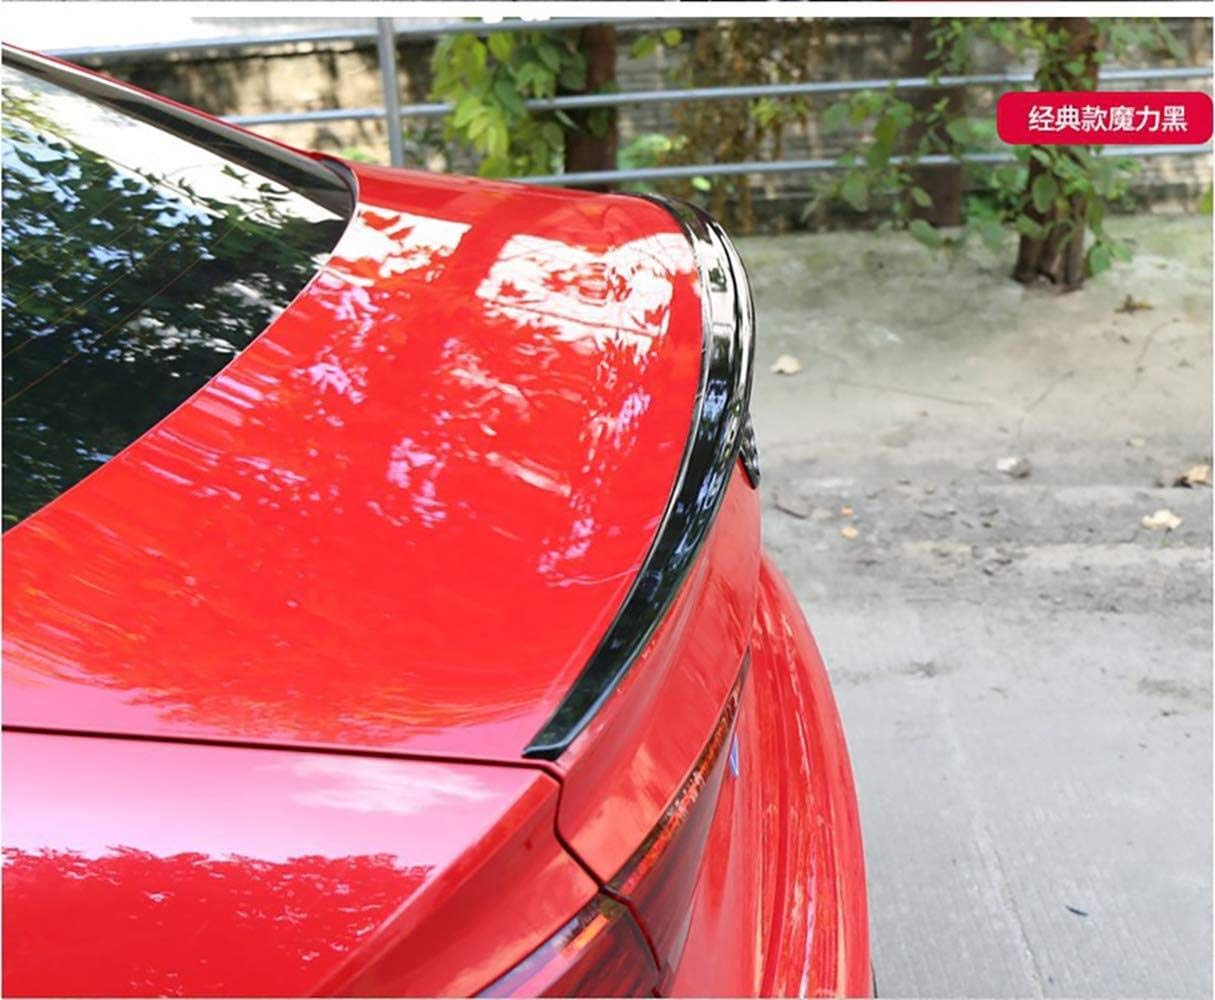 XKCCHW Aler/ón trasero para Audi A3 Sed/án 4 puertas 2013 2014 2015 2016 2017 2018 2019